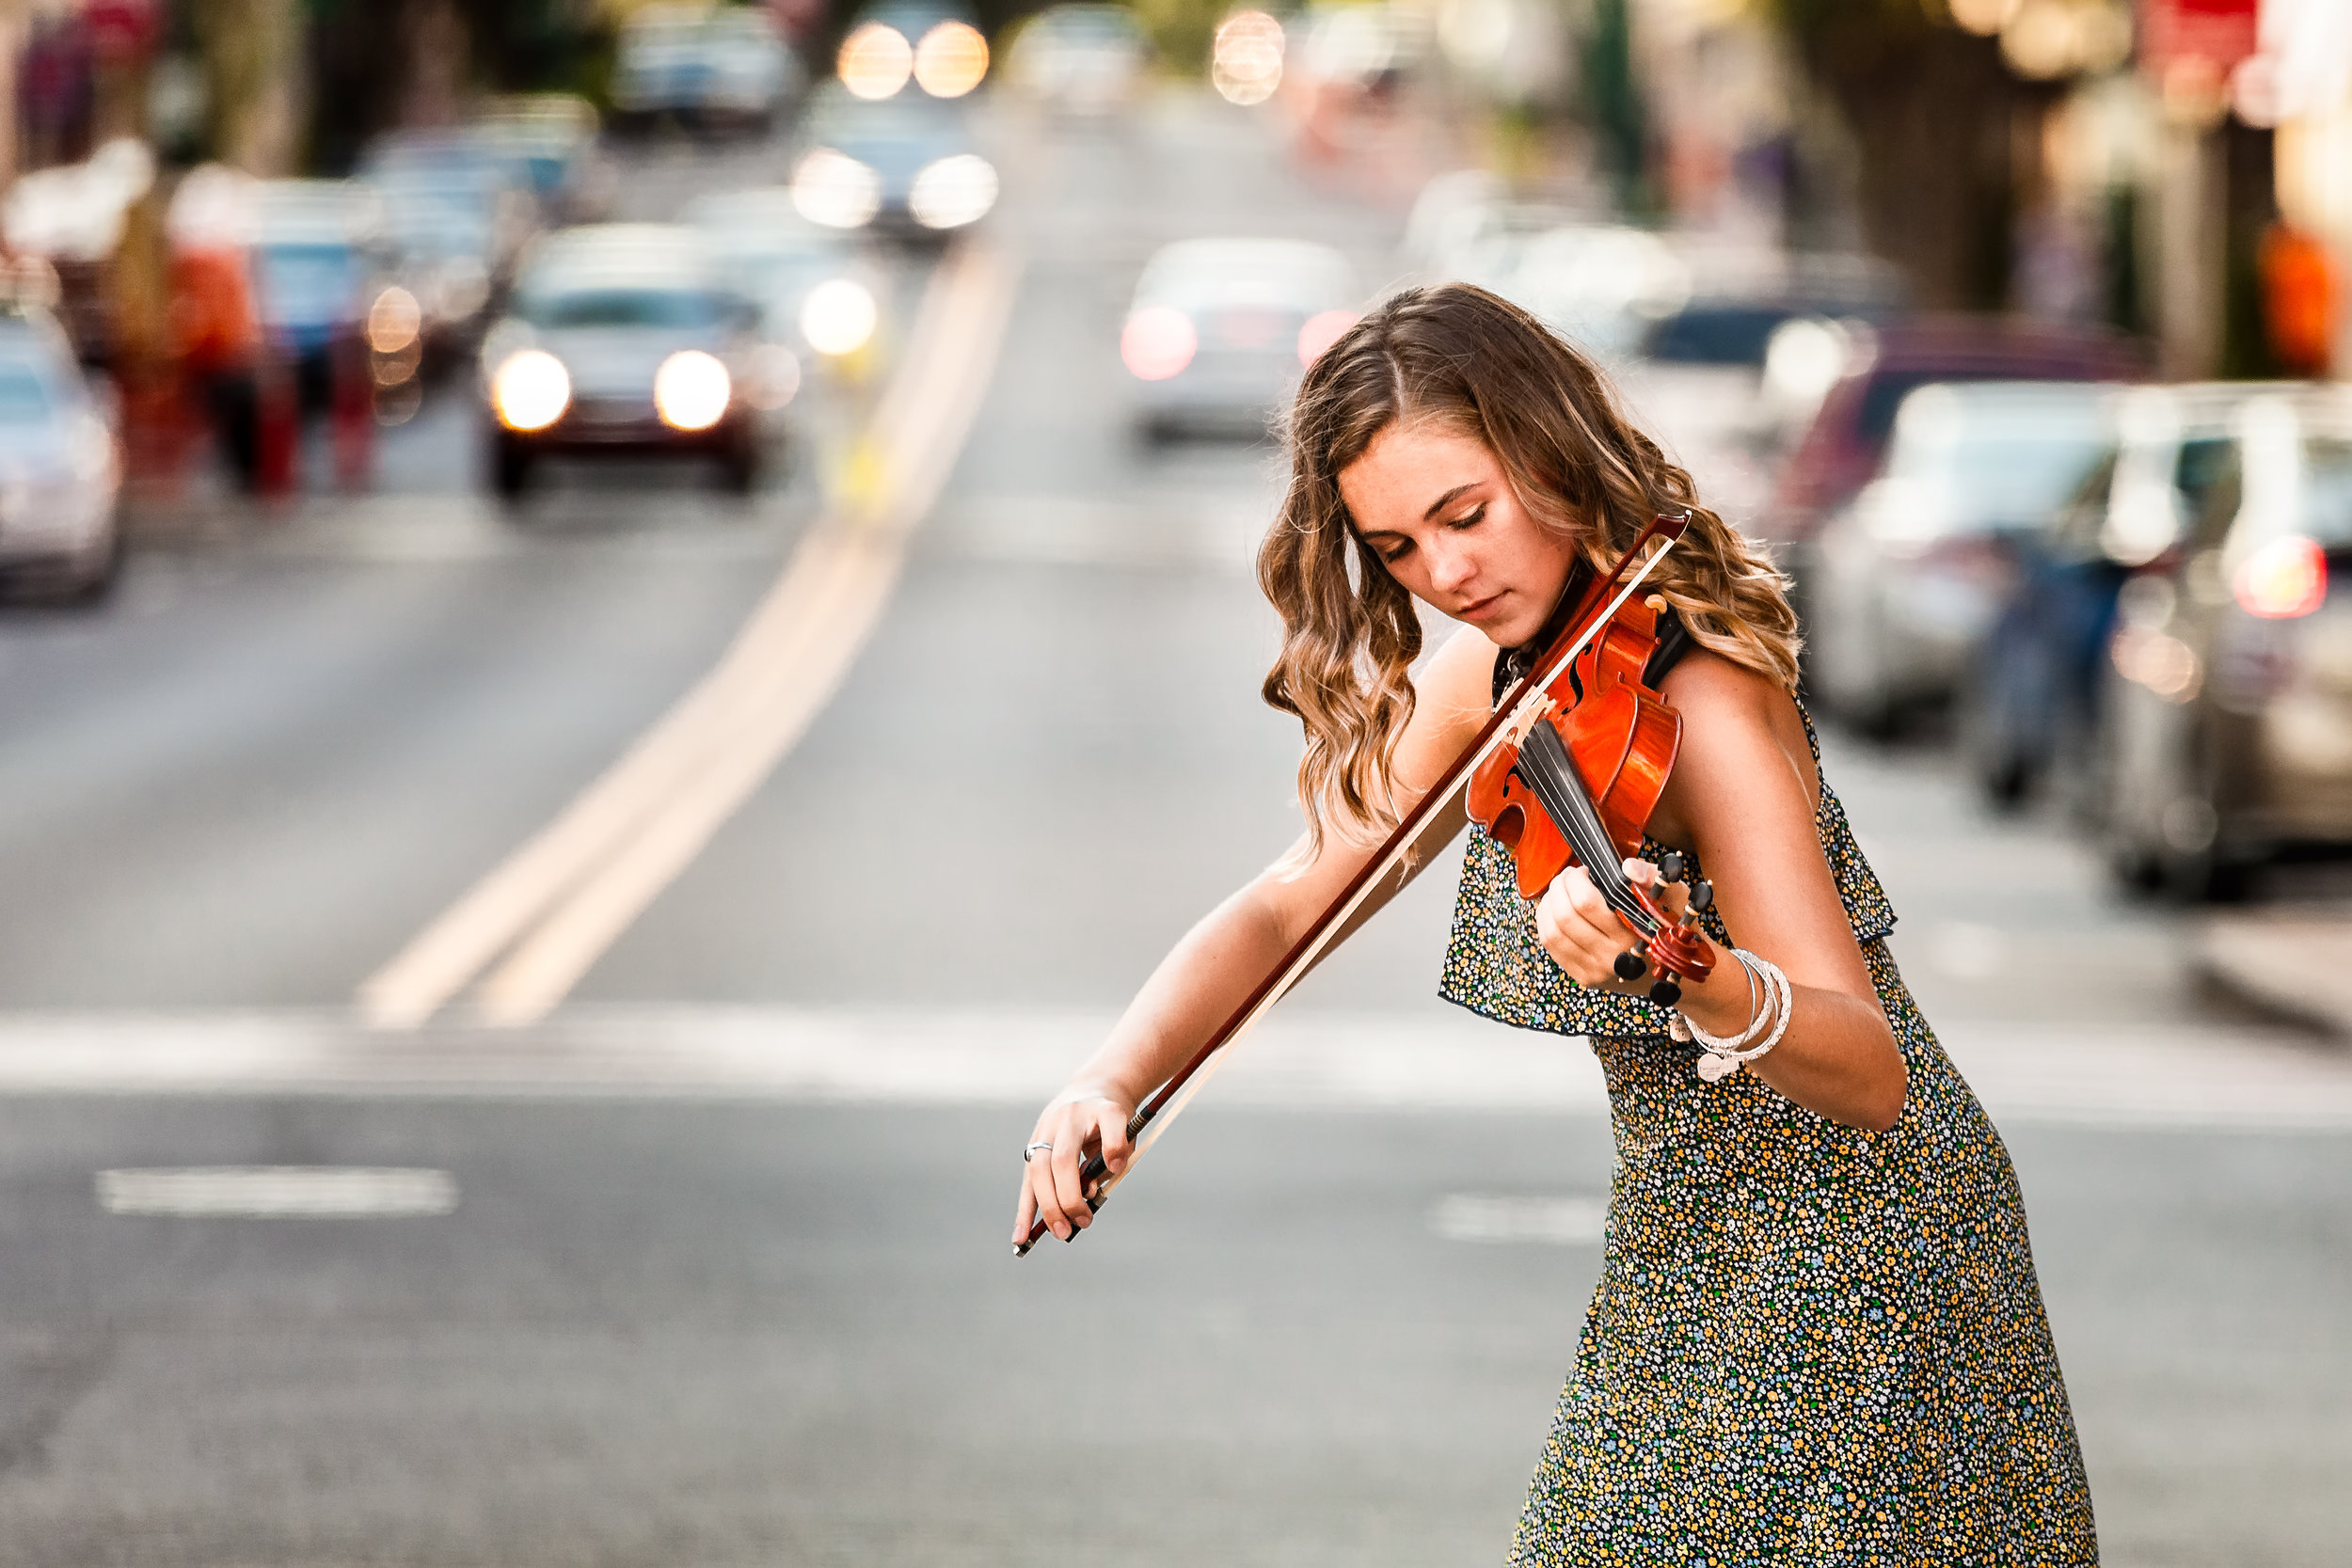 violin-in-street.jpg